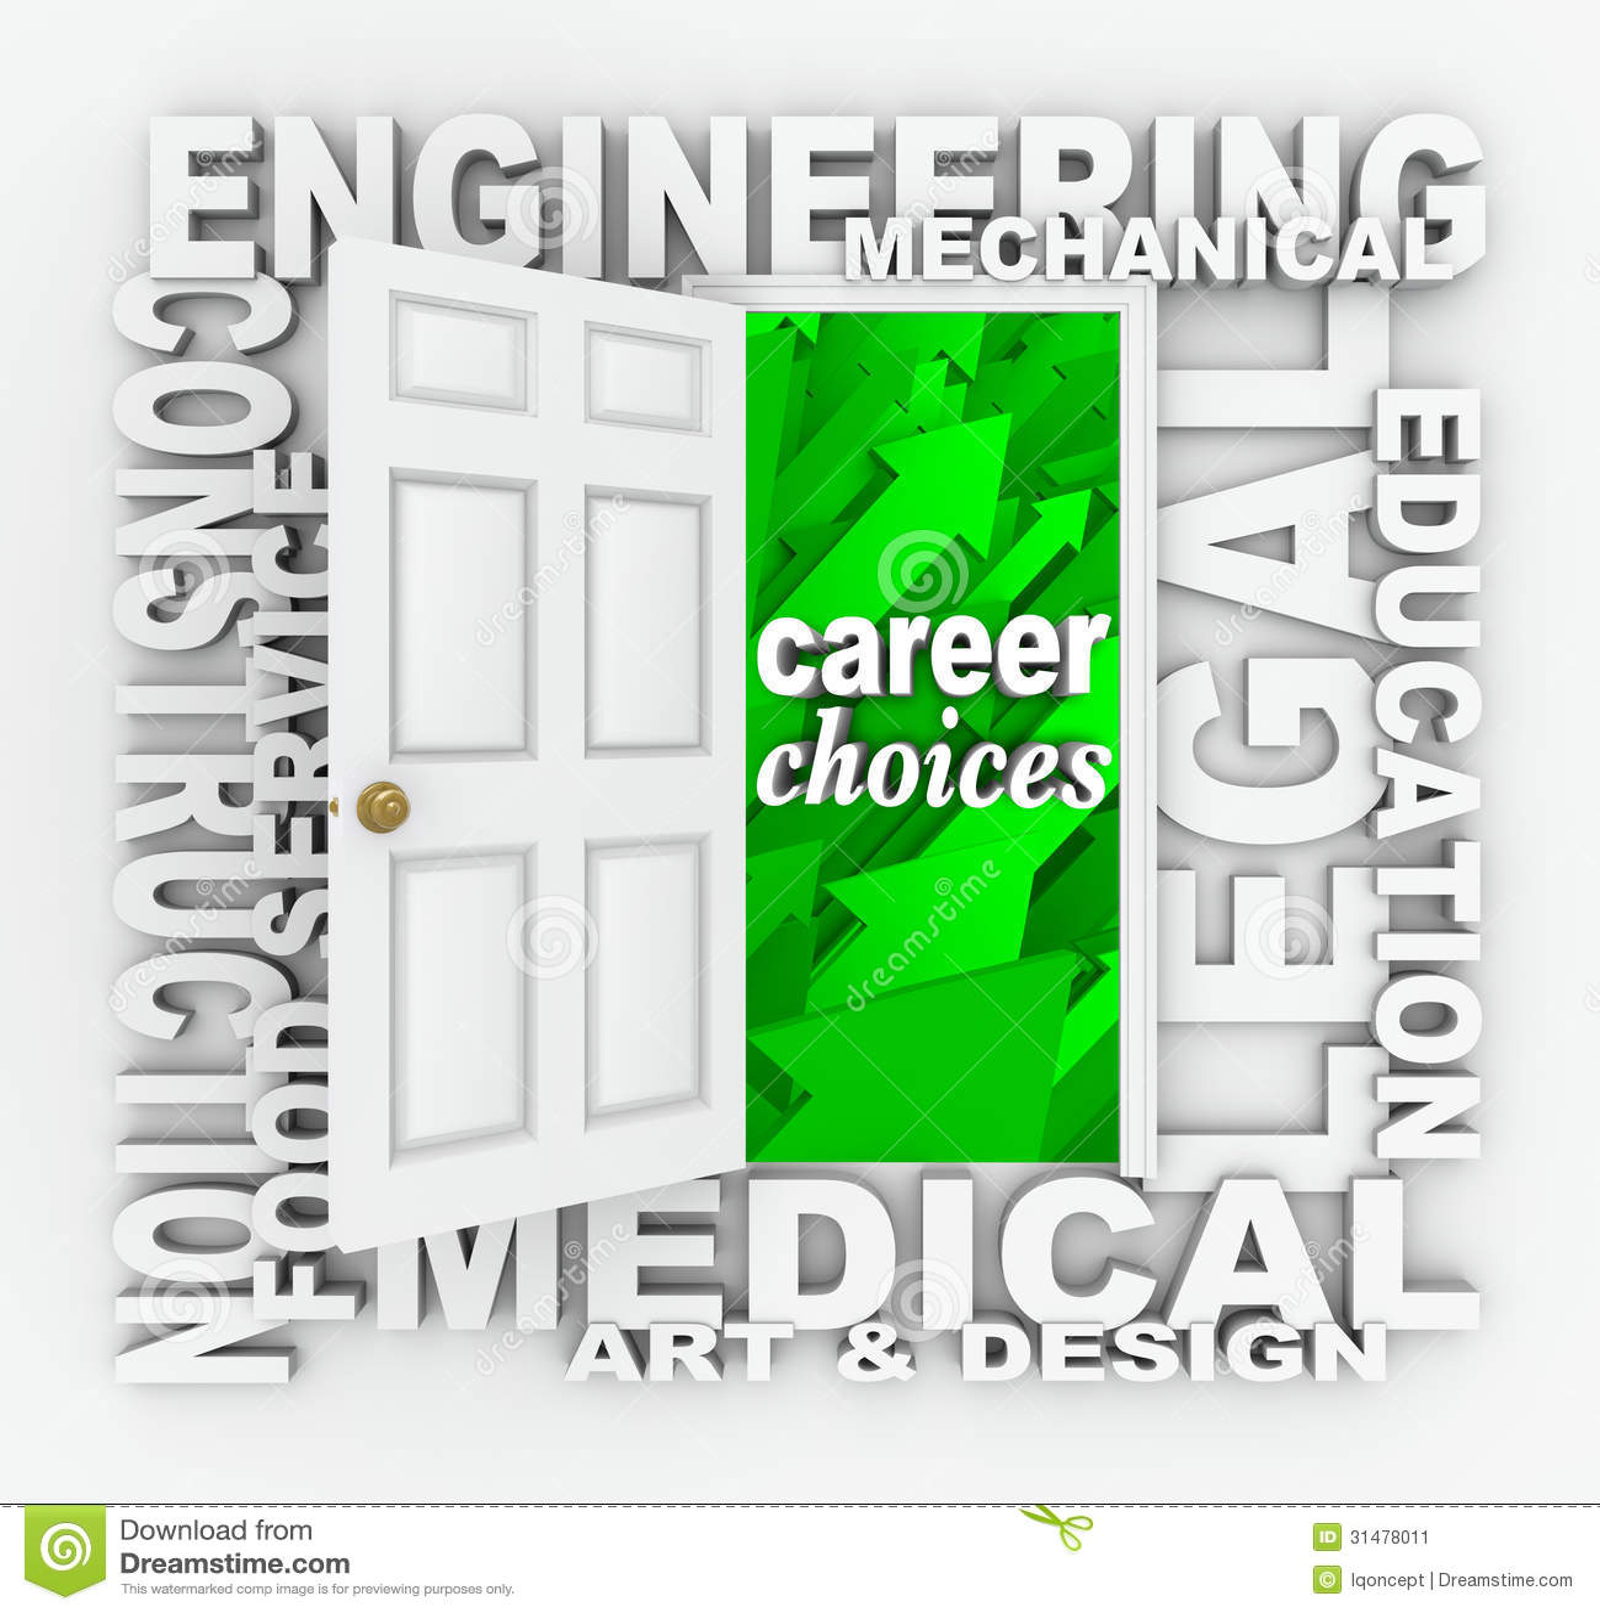 Occupation Word Door Job Choices Opportunities Stock Math Wallpaper Golden Find Free HD for Desktop [pastnedes.tk]